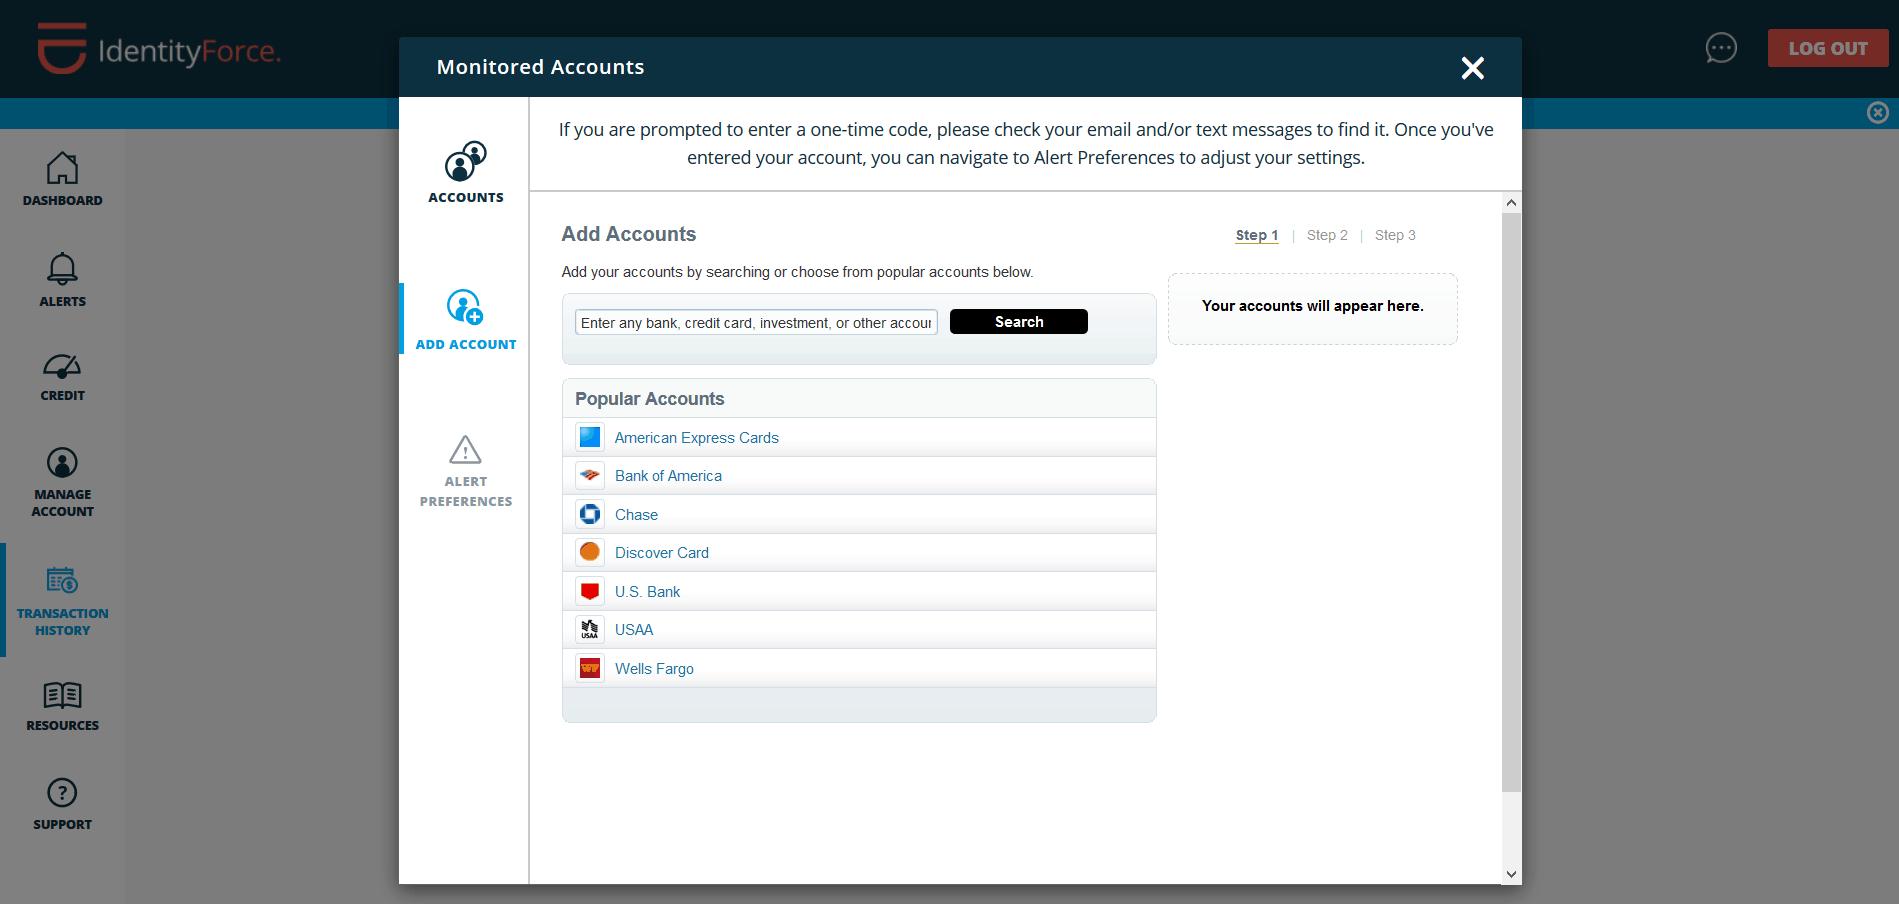 IdentityForce - Monitored Accounts